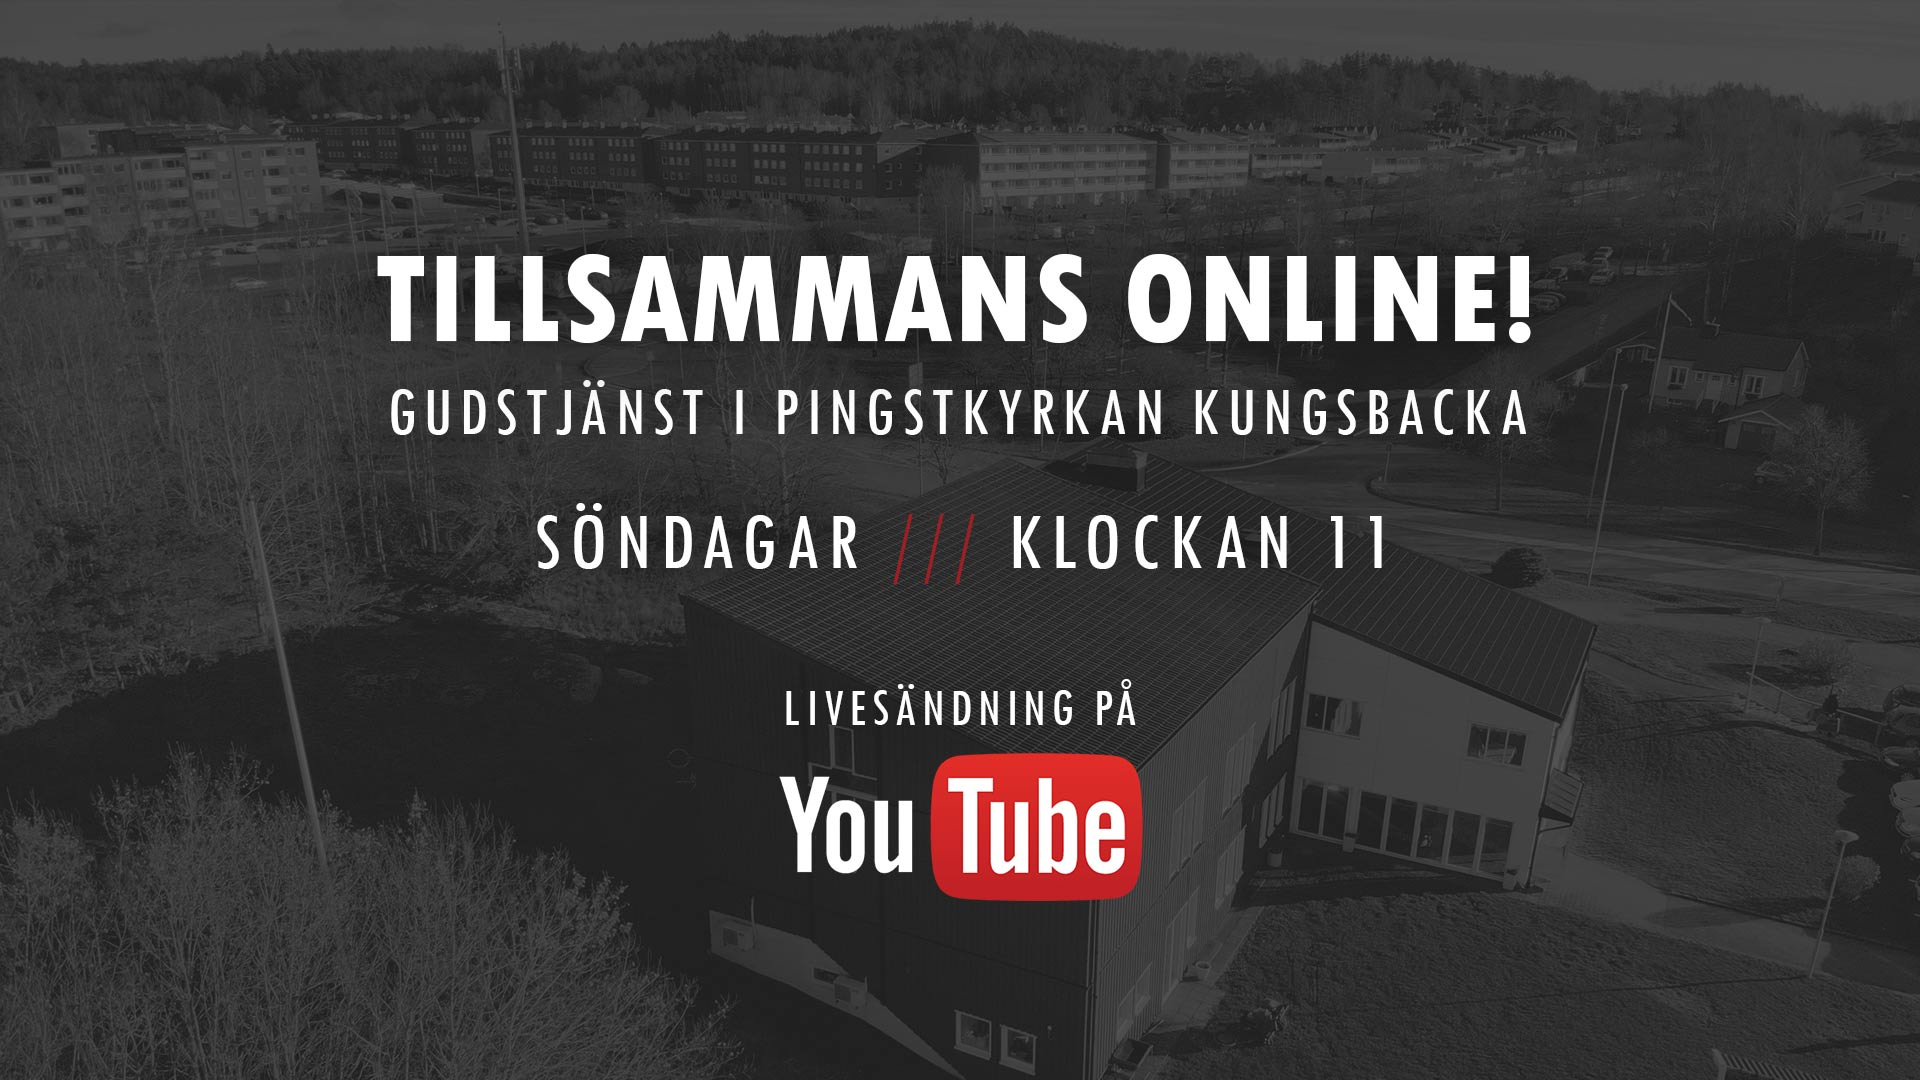 Livesändning på YouTube